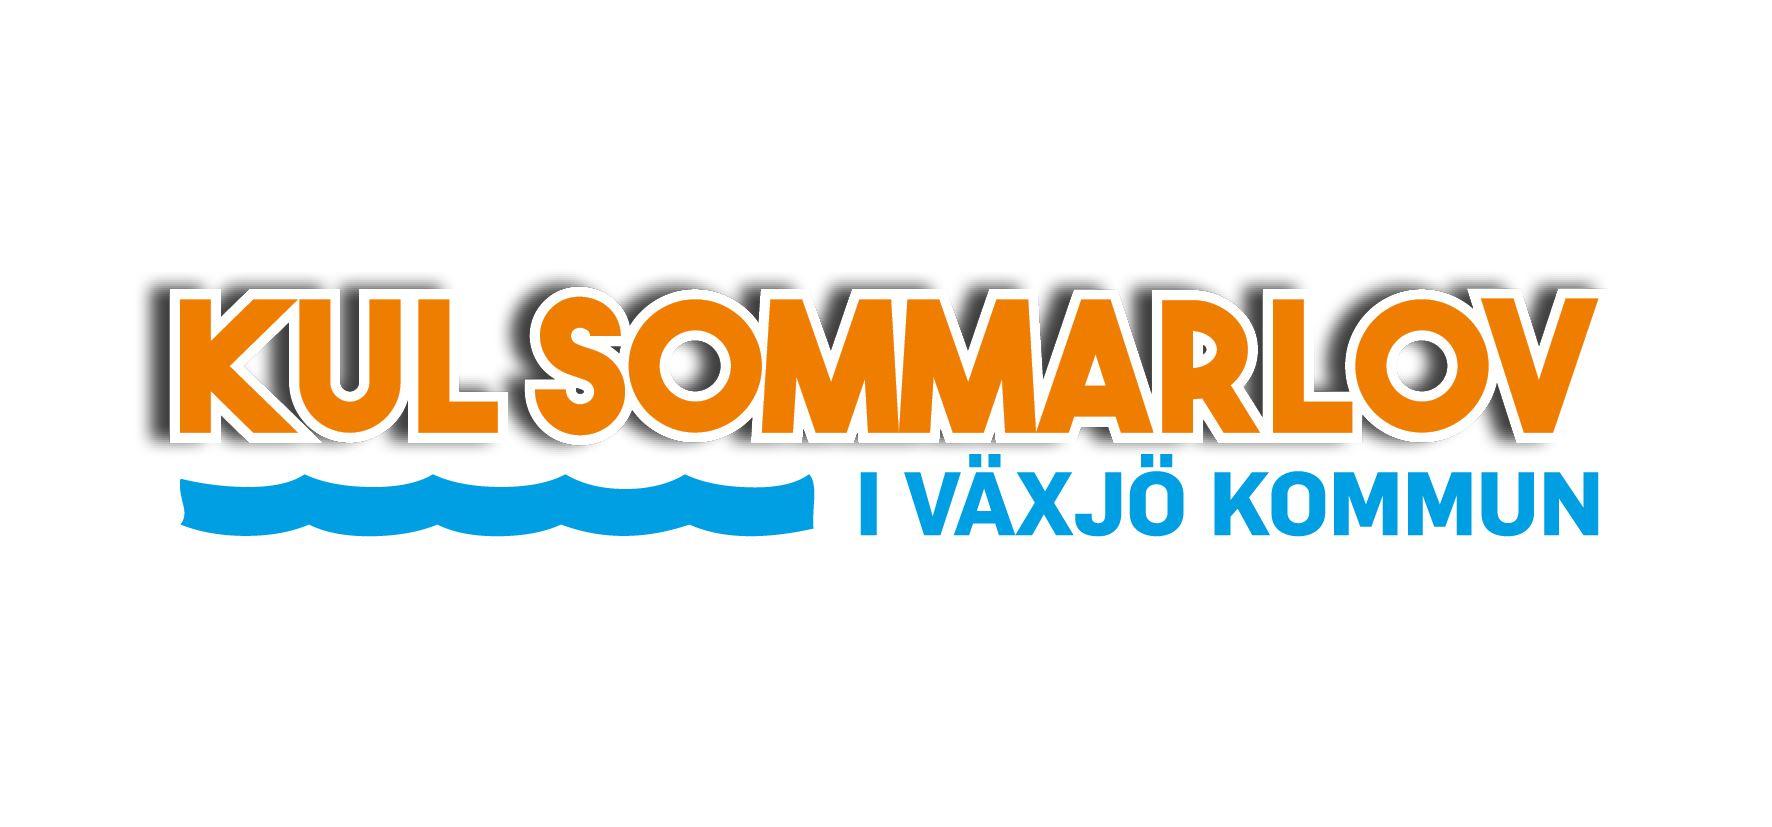 Kul sommarlov: Sportcamp